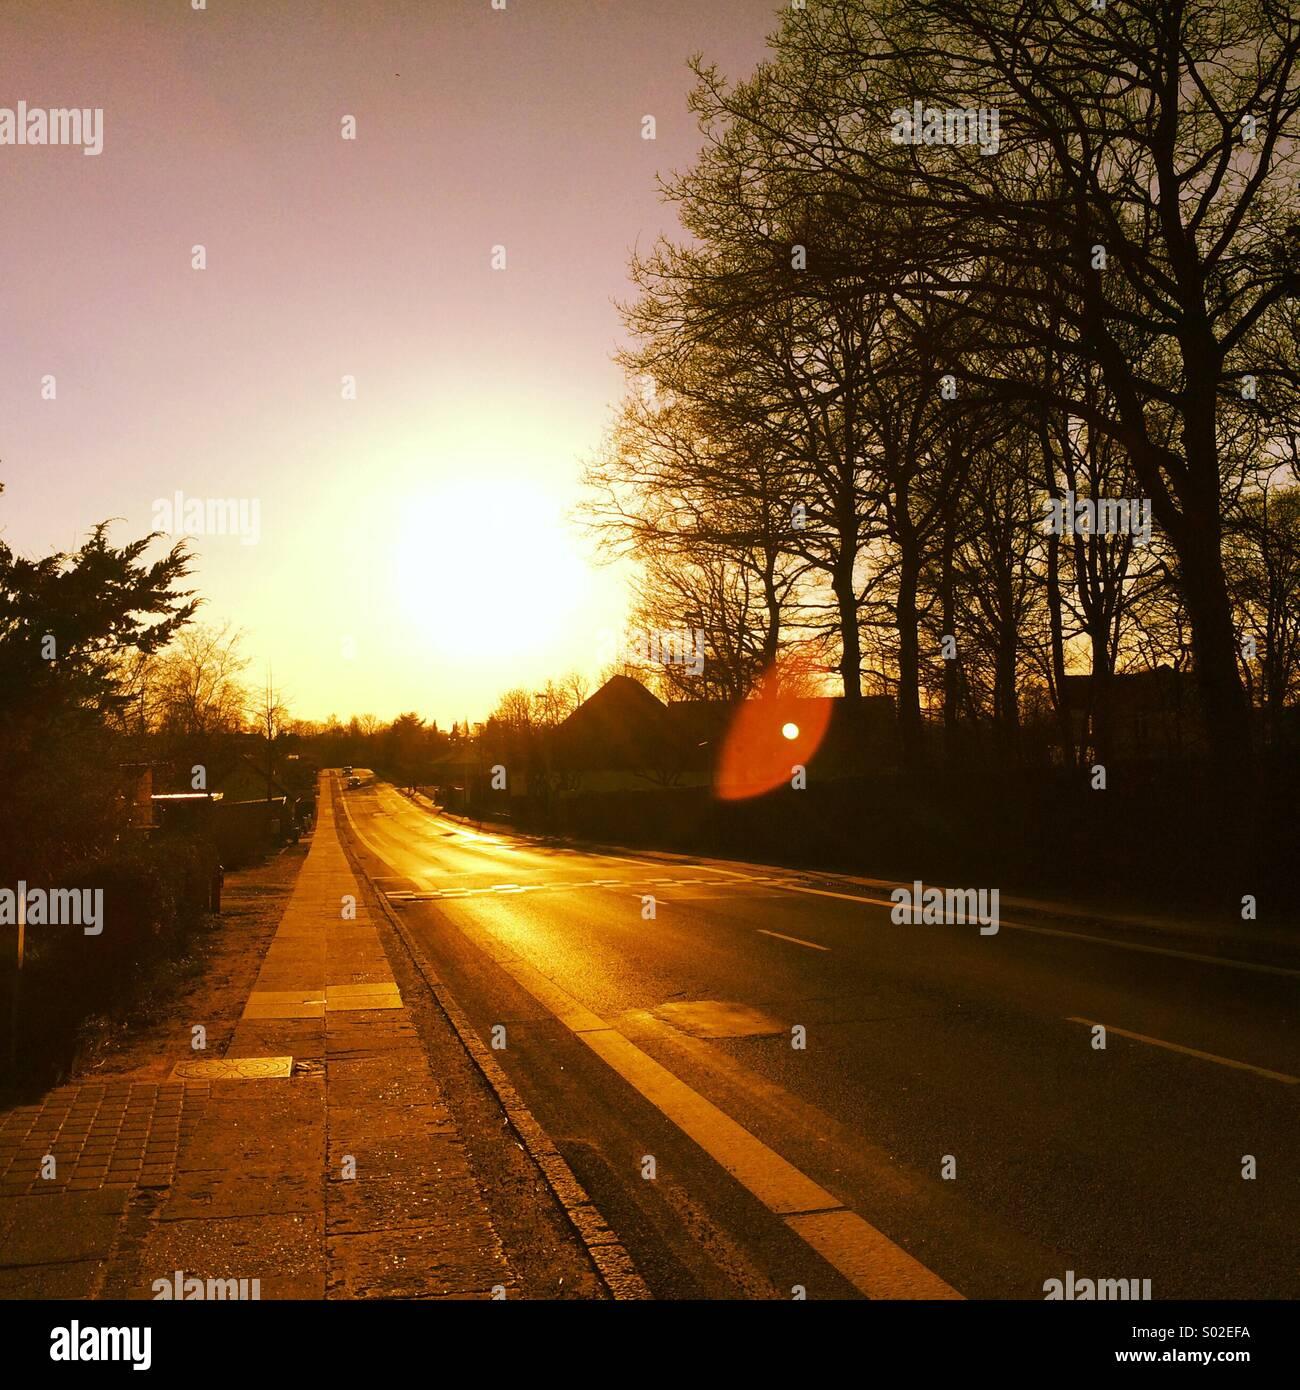 Sonnenuntergang, Abschied heute Morgen willkommen Stockbild